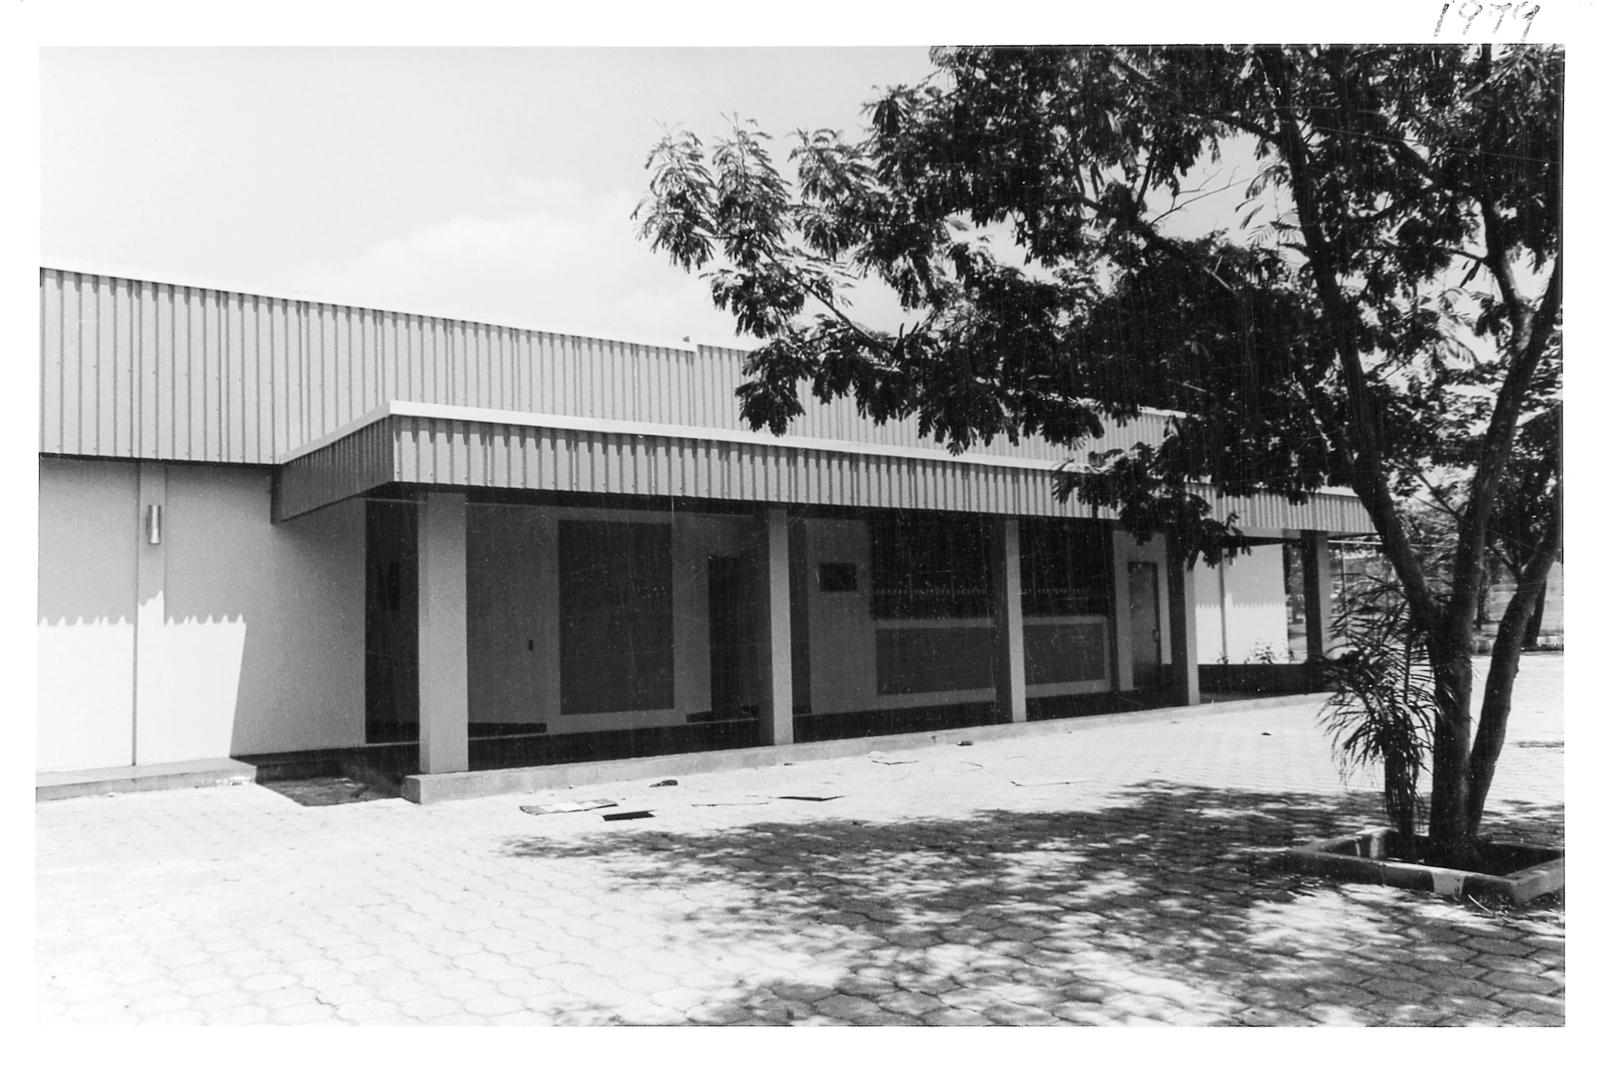 Managua - Consulate Office Building - 1979